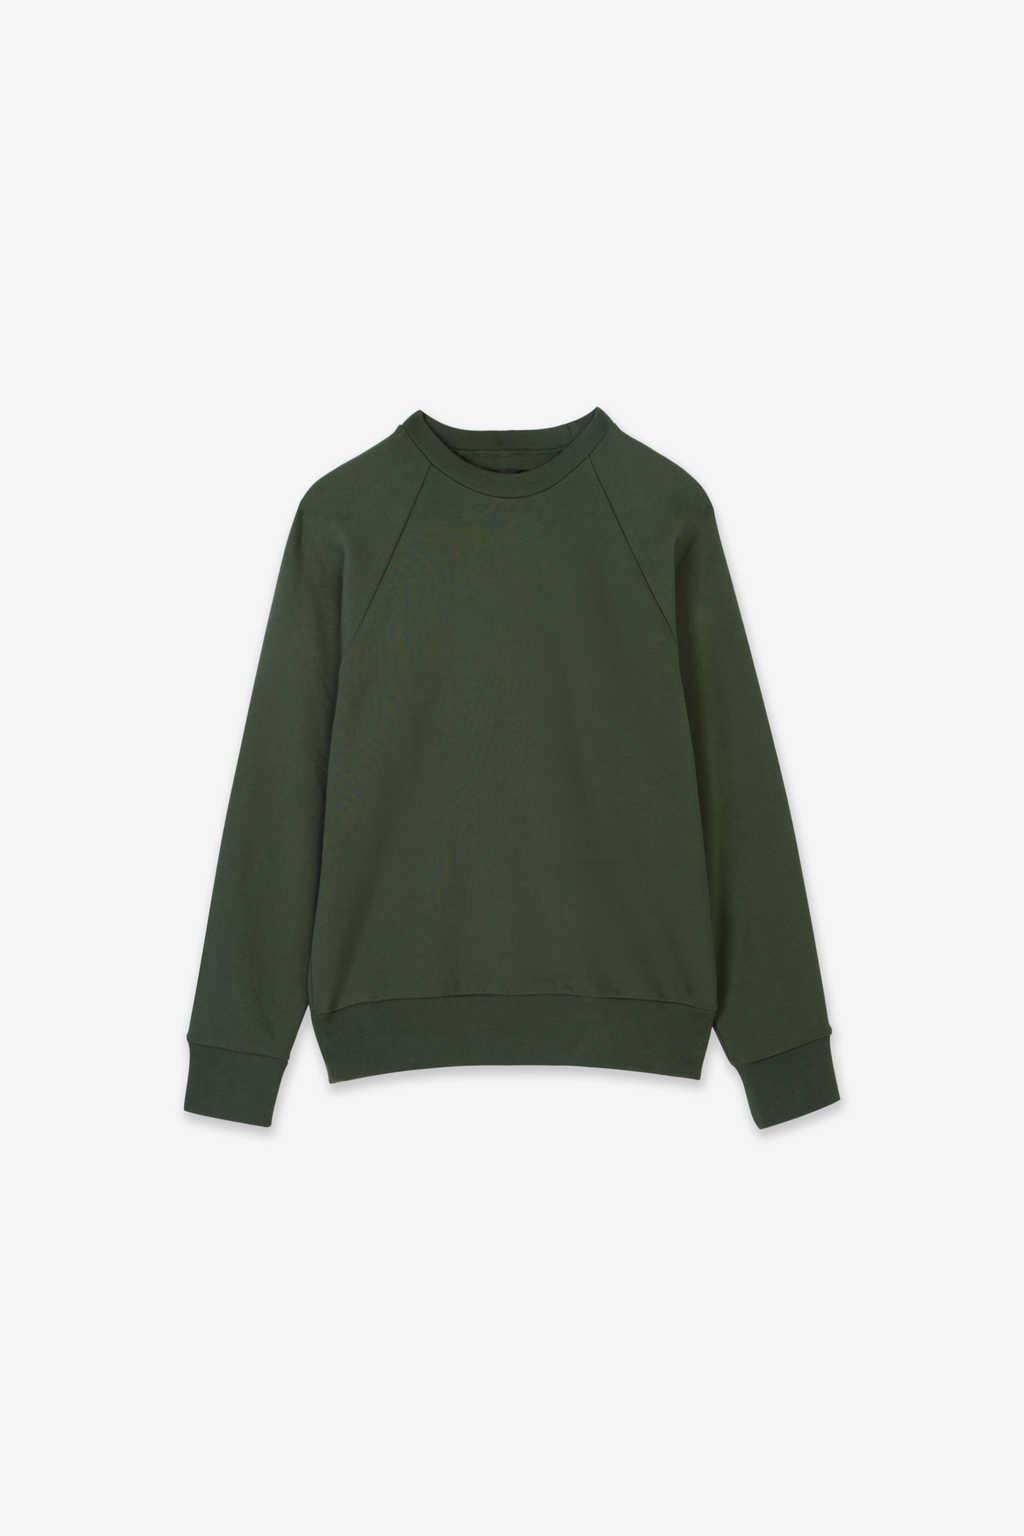 Sweatshirt 2474 Green 11